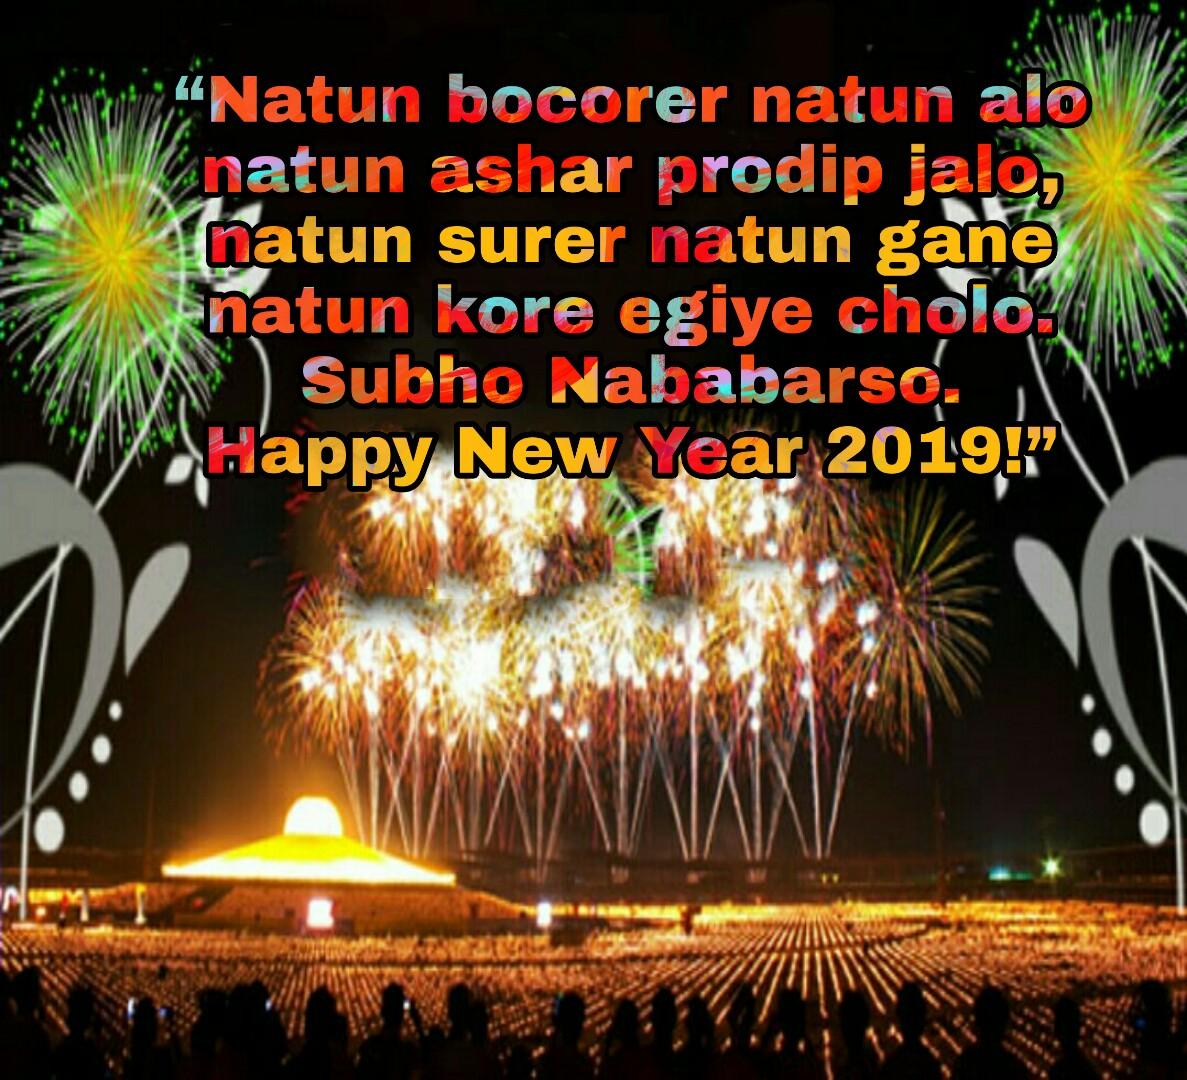 New Year Wishes In Bengali Happy New Year 2019 6061719 Salonurodyinfo